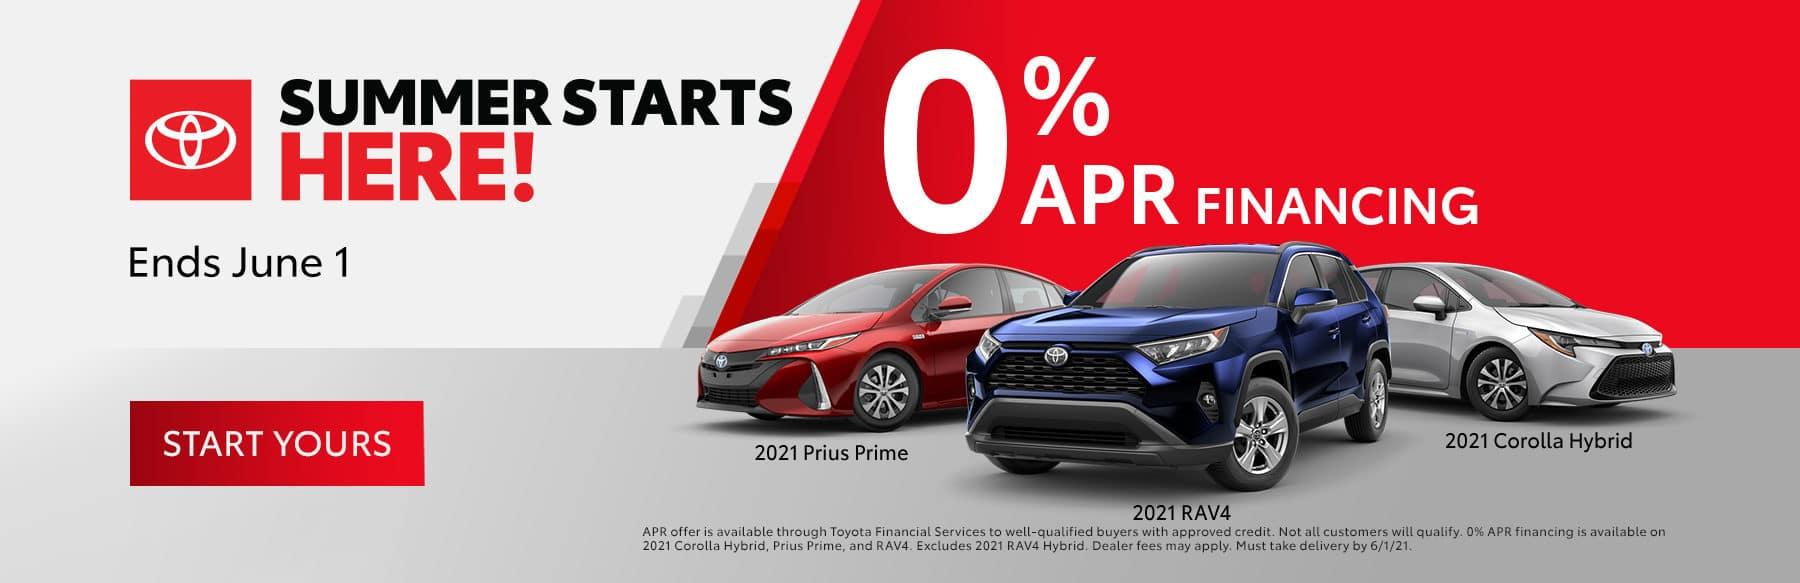 Toyota Summer Starts Here